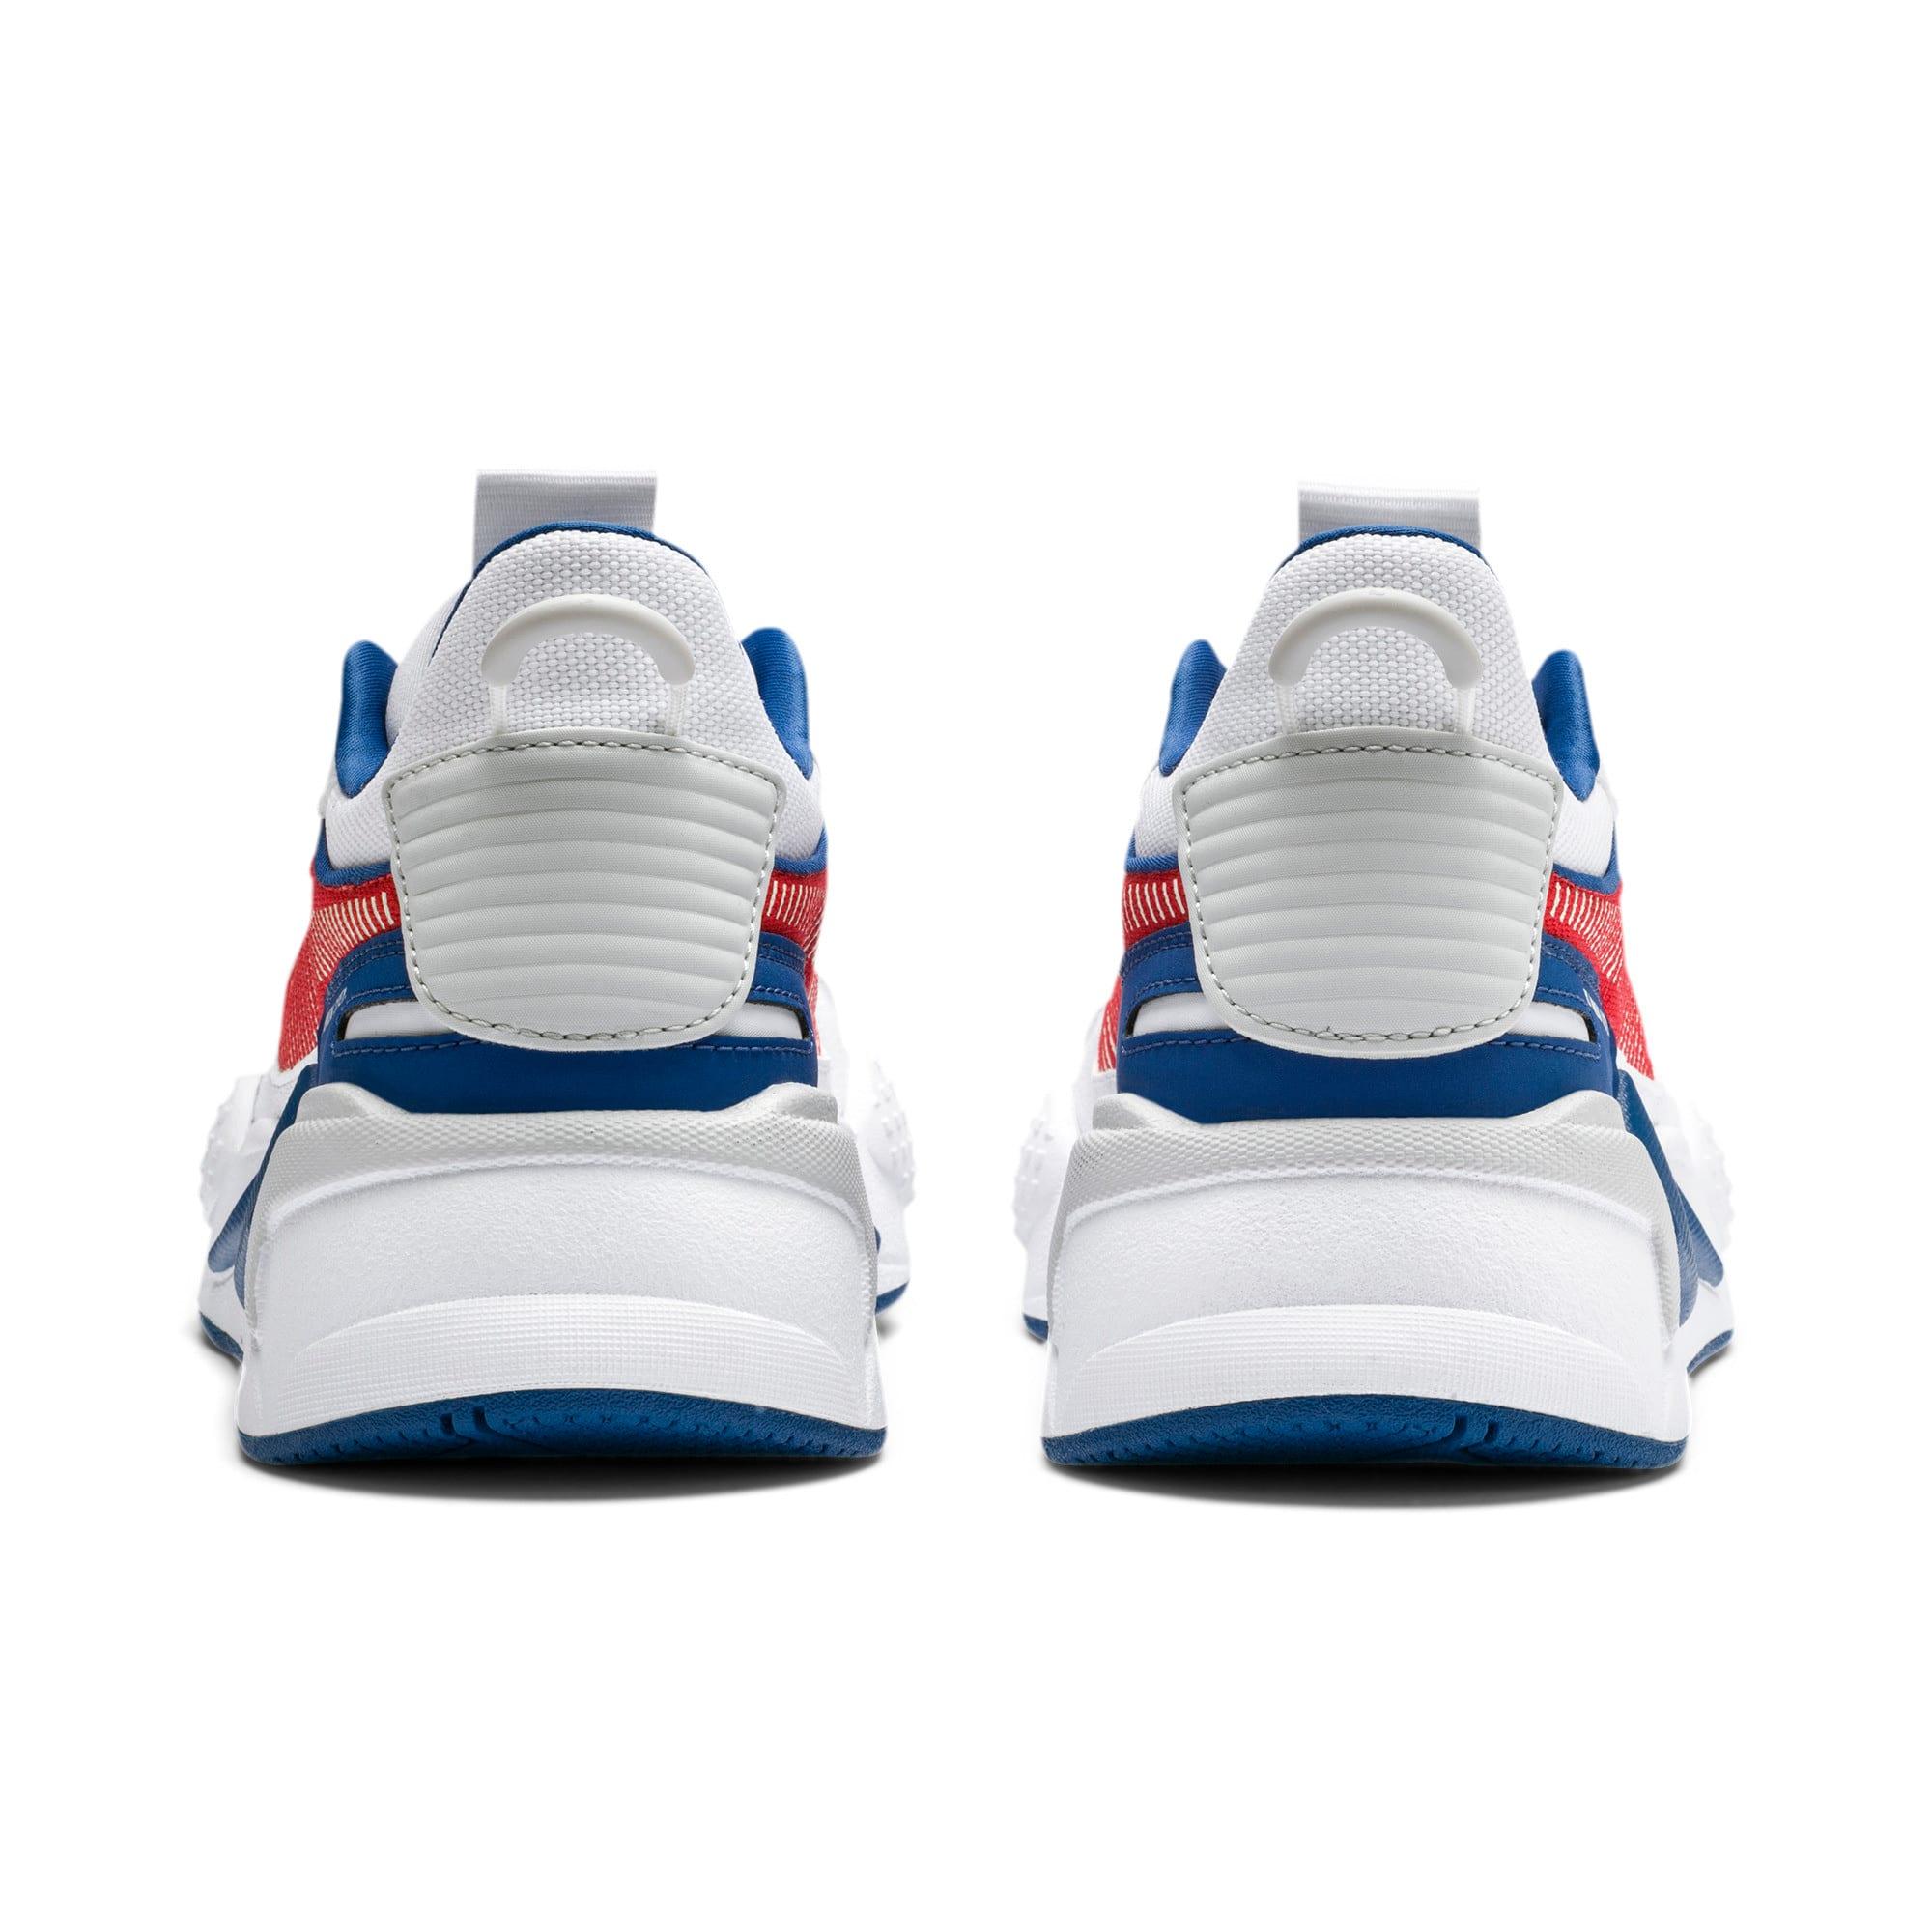 Thumbnail 3 of RS-X Hard Drive Sneakers JR, Puma White-High Risk Red, medium